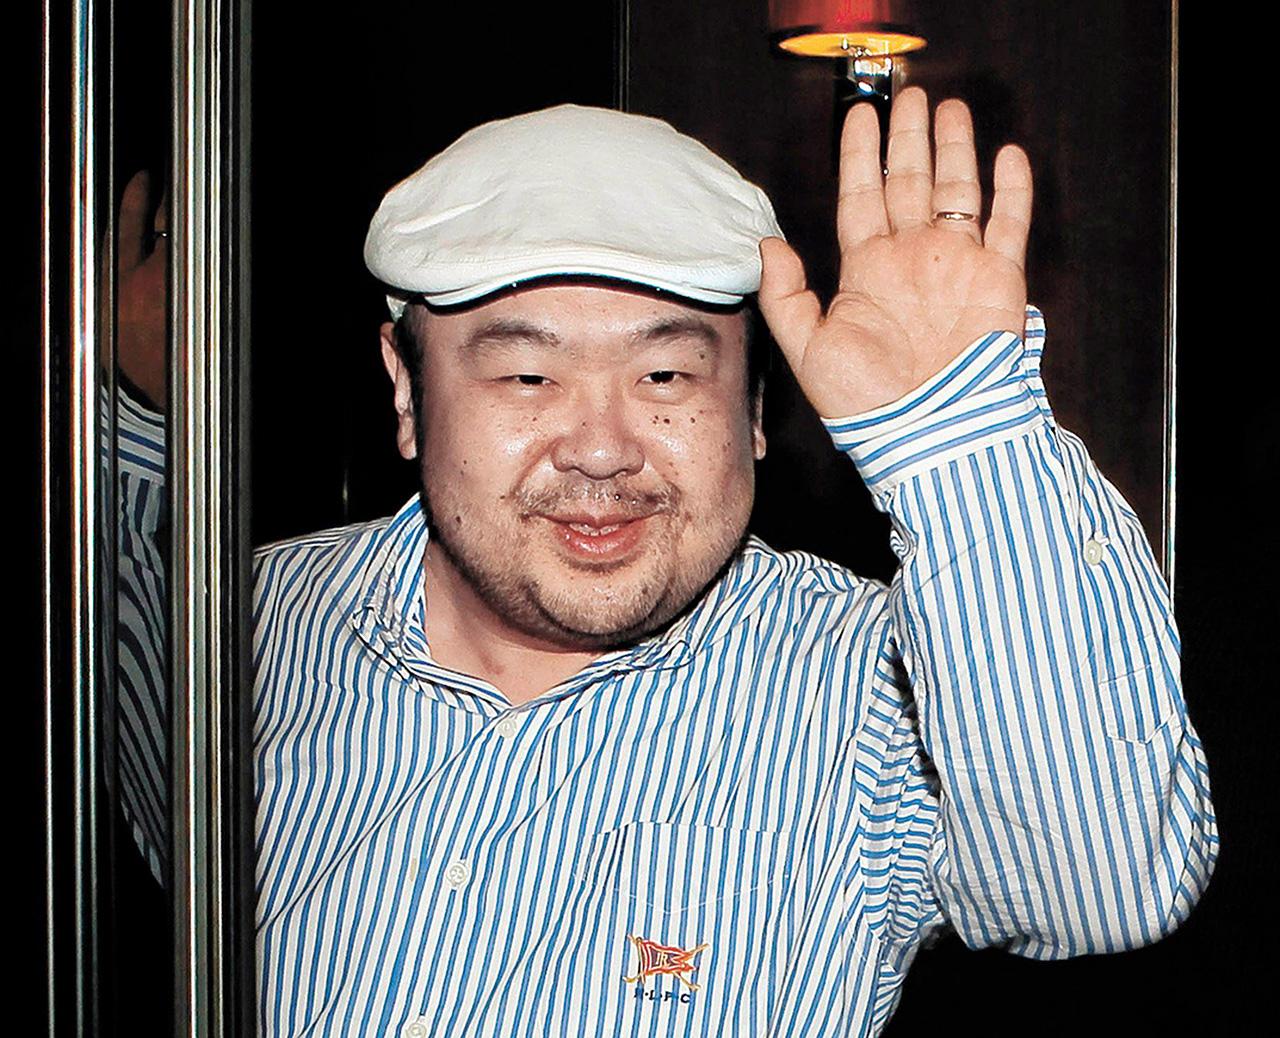 Kim Jon-nam was killed in Kuala Lumpur on Feb. 13, 2016, allegedly by North Korean agents.